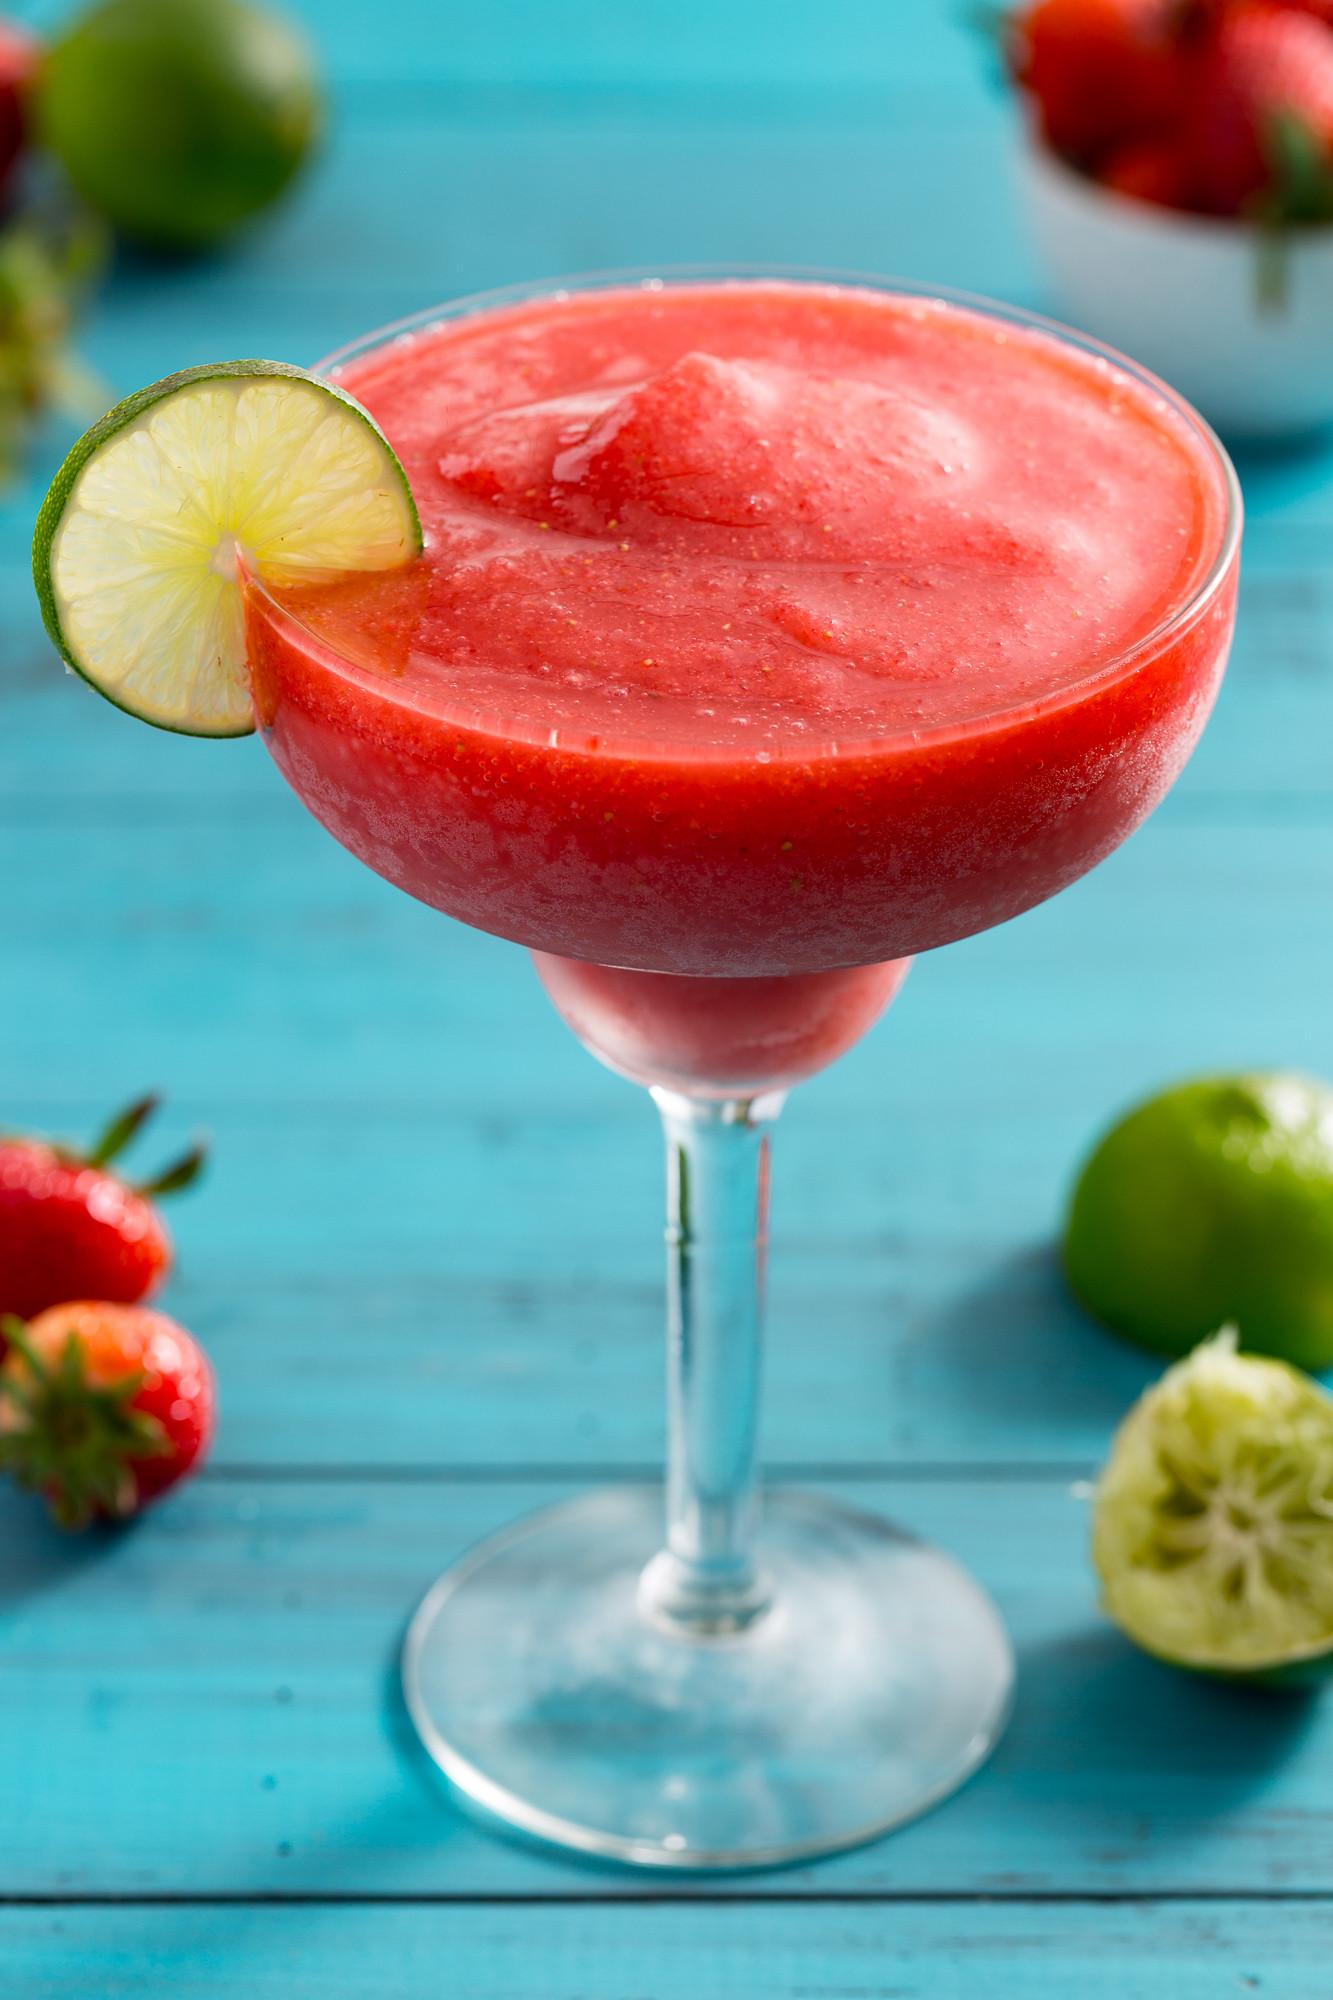 Strawberry Rum Drinks  Easy Frozen Strawberry Daiquiri Recipe How to Make a